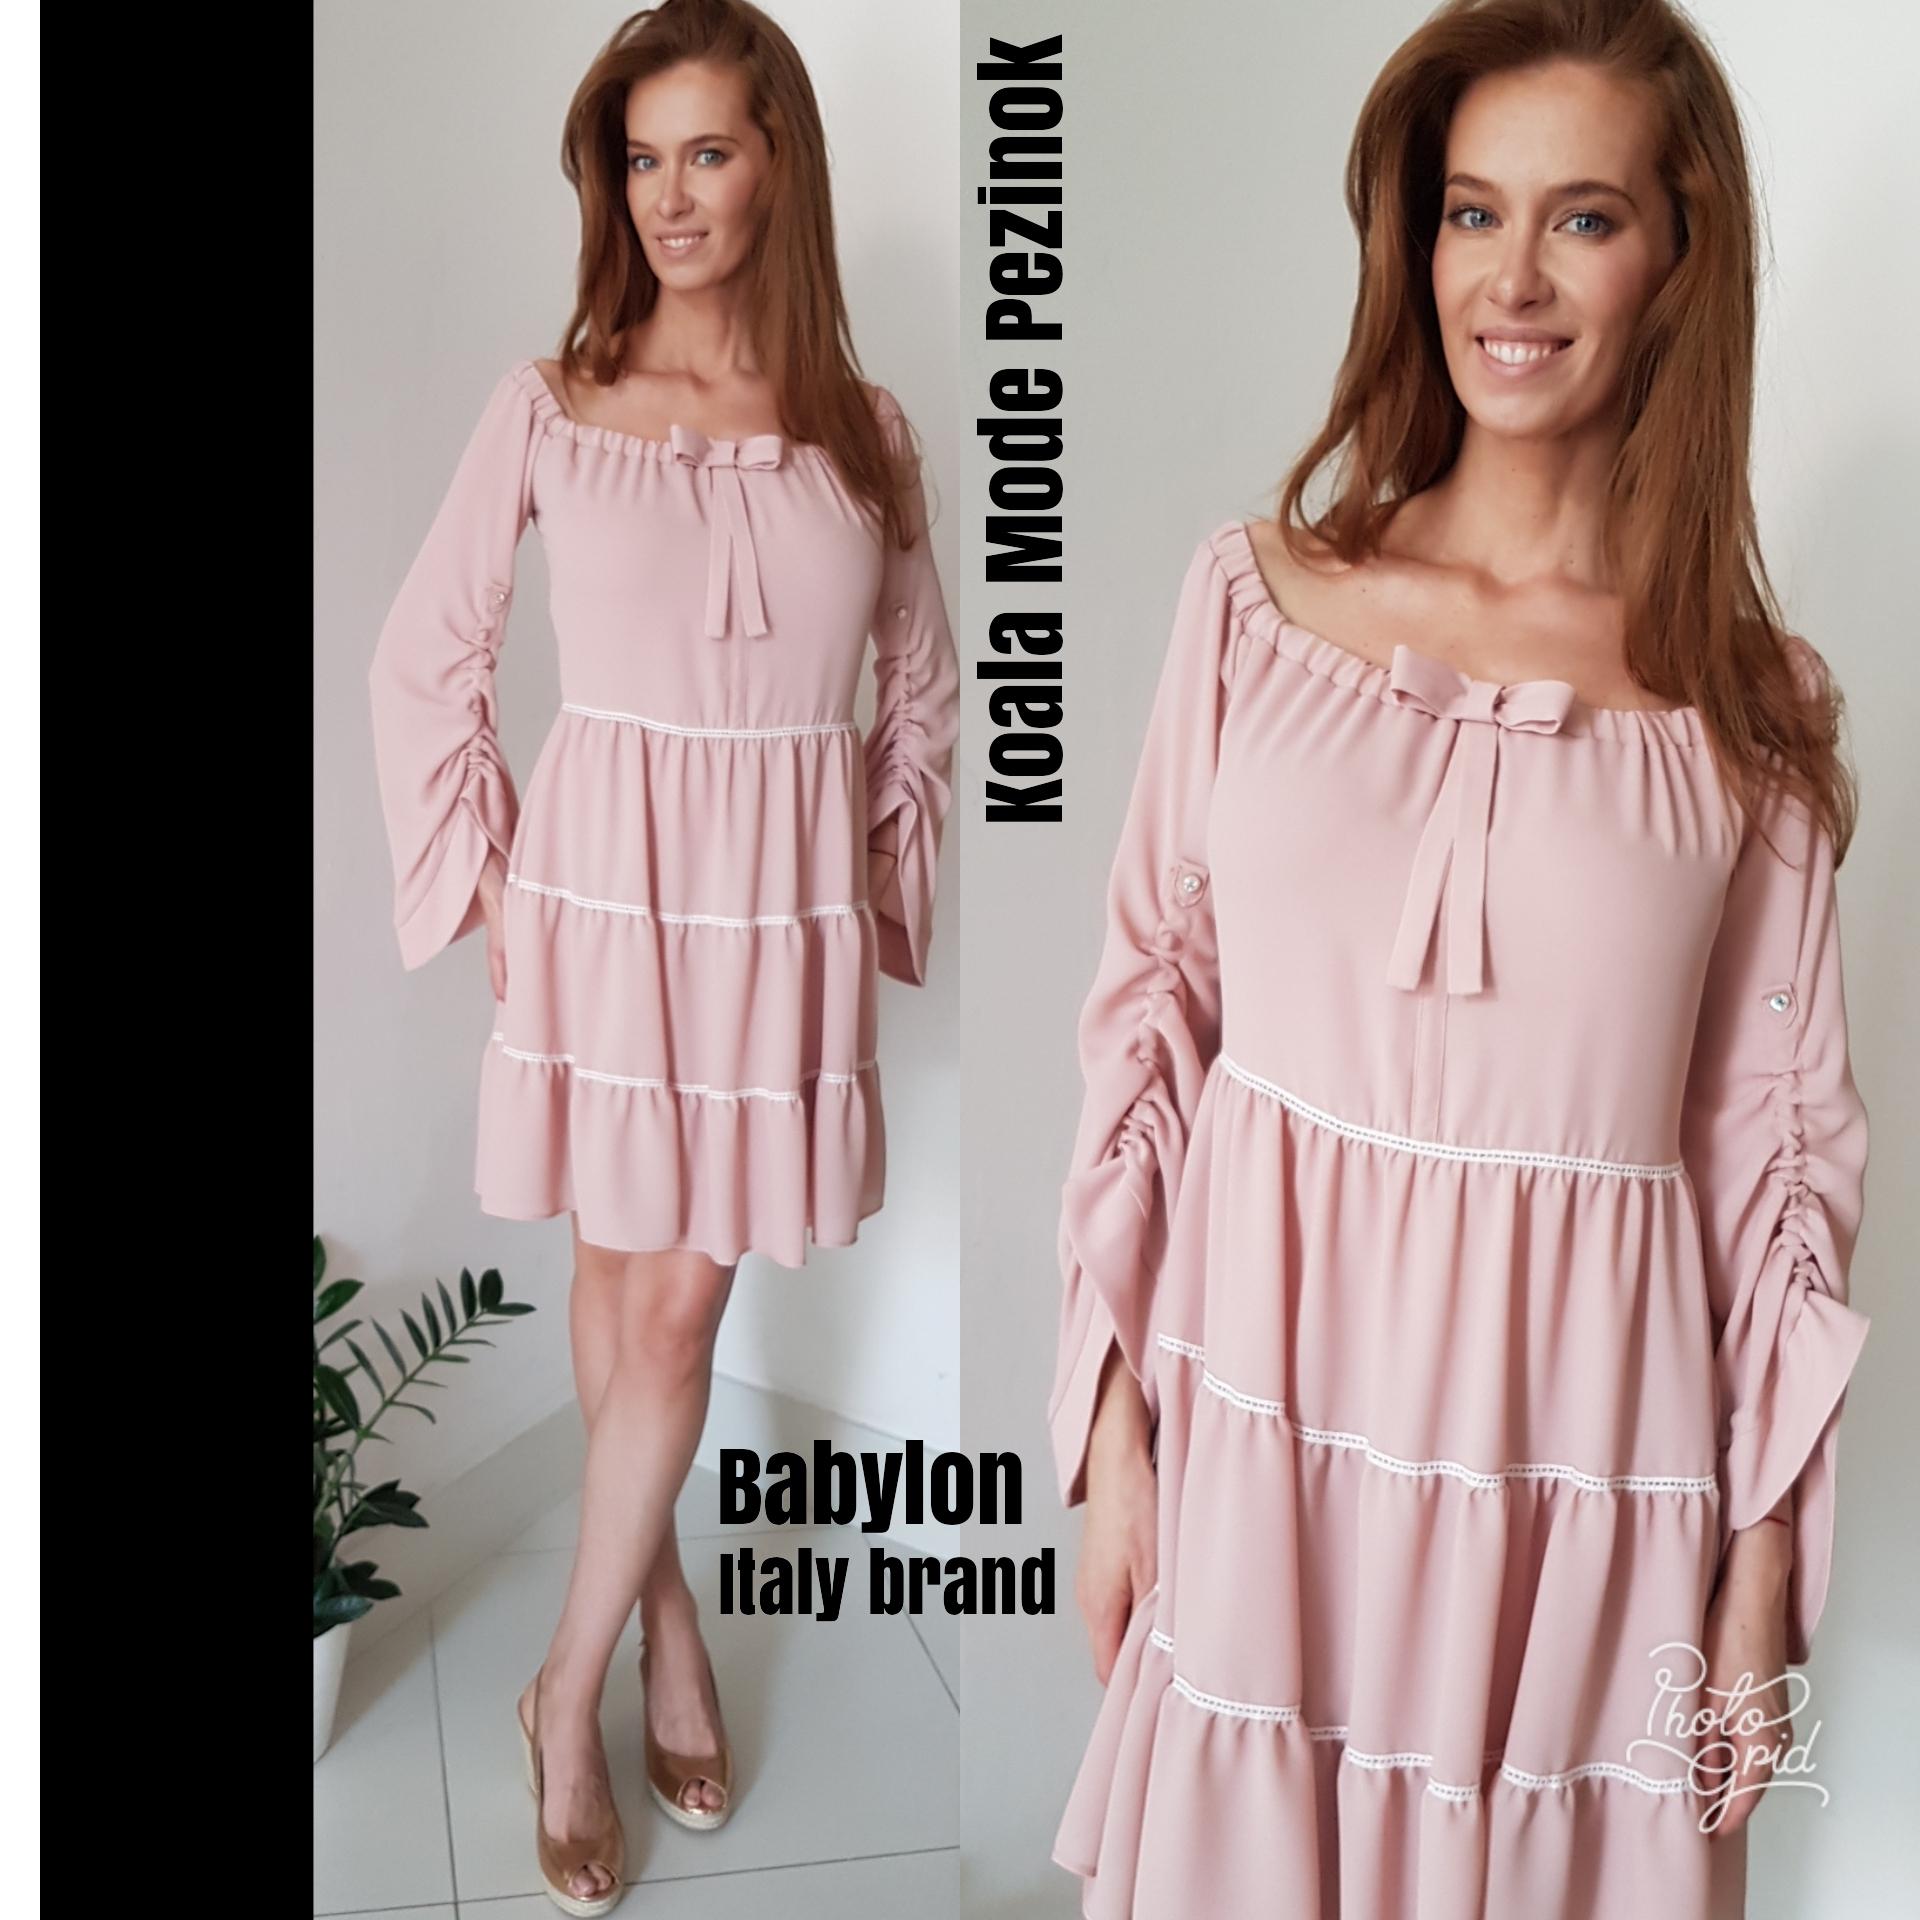 db0ebf609571 Šaty púdrové luxusná talianska značka Eureka Babylon